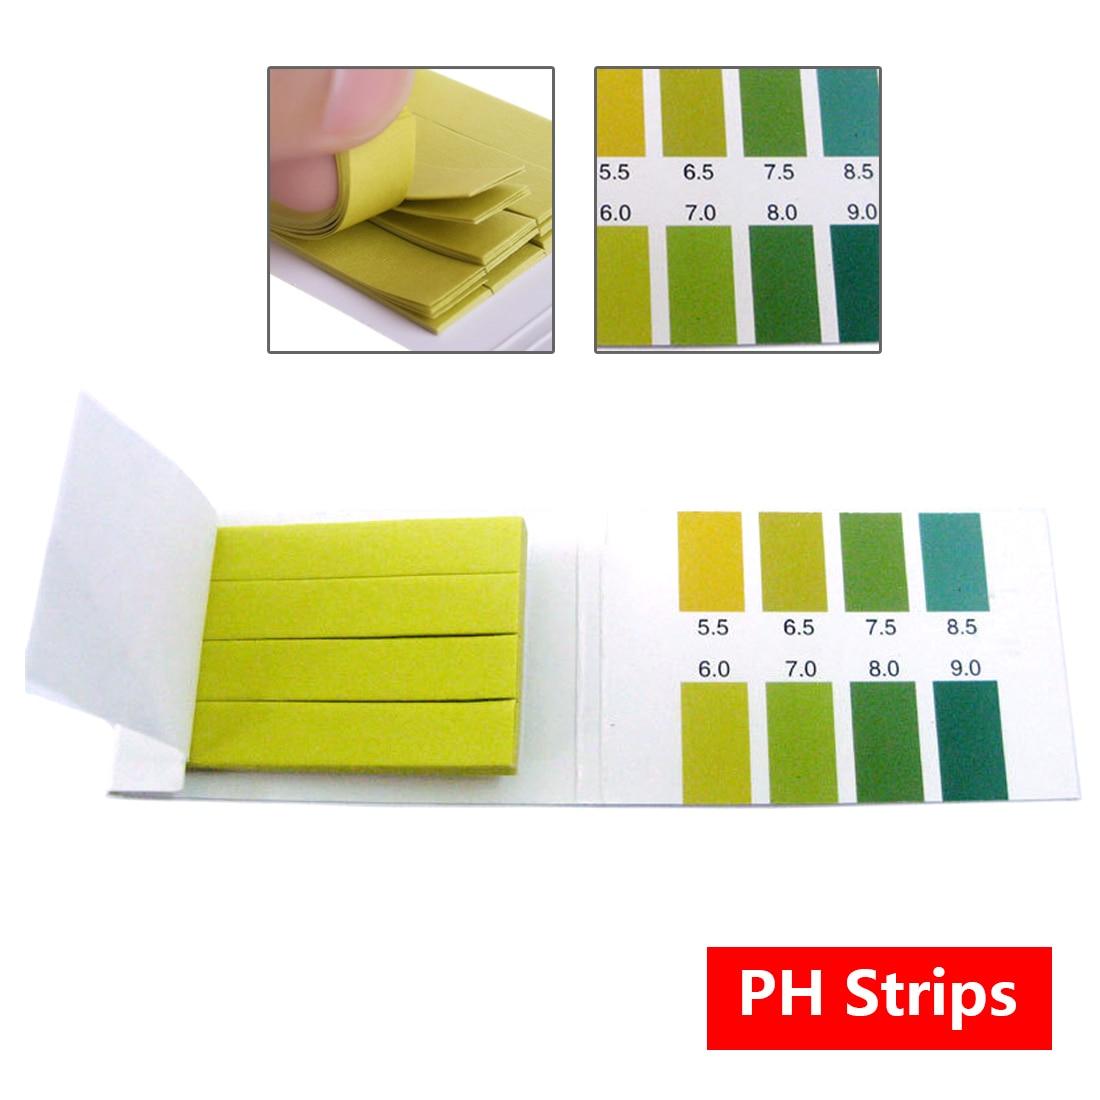 80 PH Strips 5.5-9.0 Litmus Paper PH Tester Papers Universal Indicator Paper Test For Water Aquarium